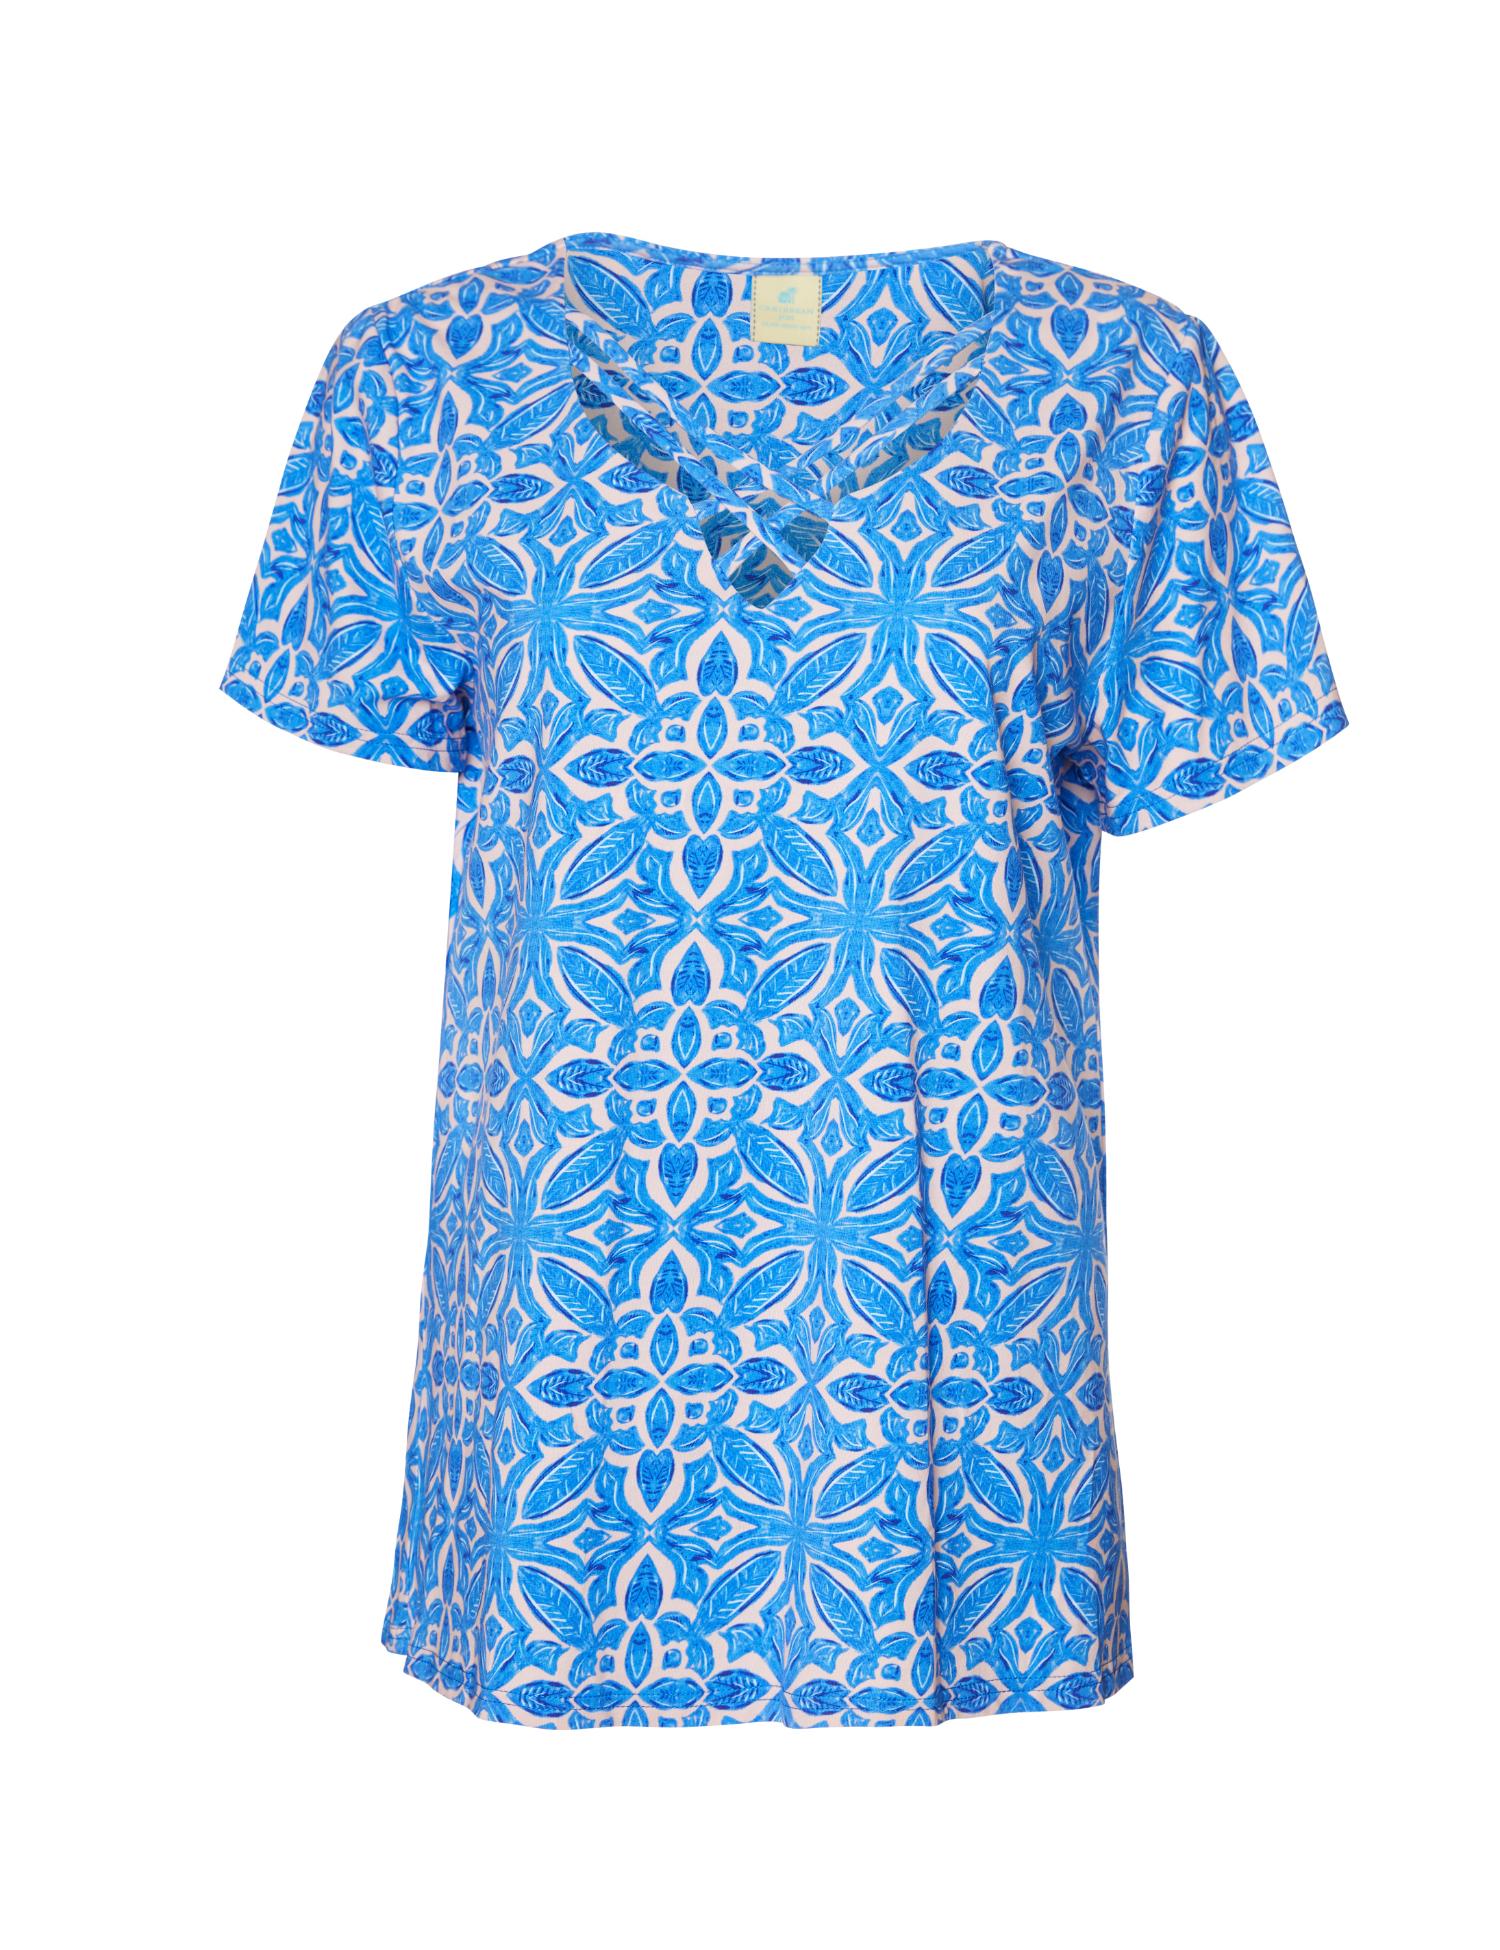 Caribbean Joe® Criss Cross Knit Top -Blue - Front